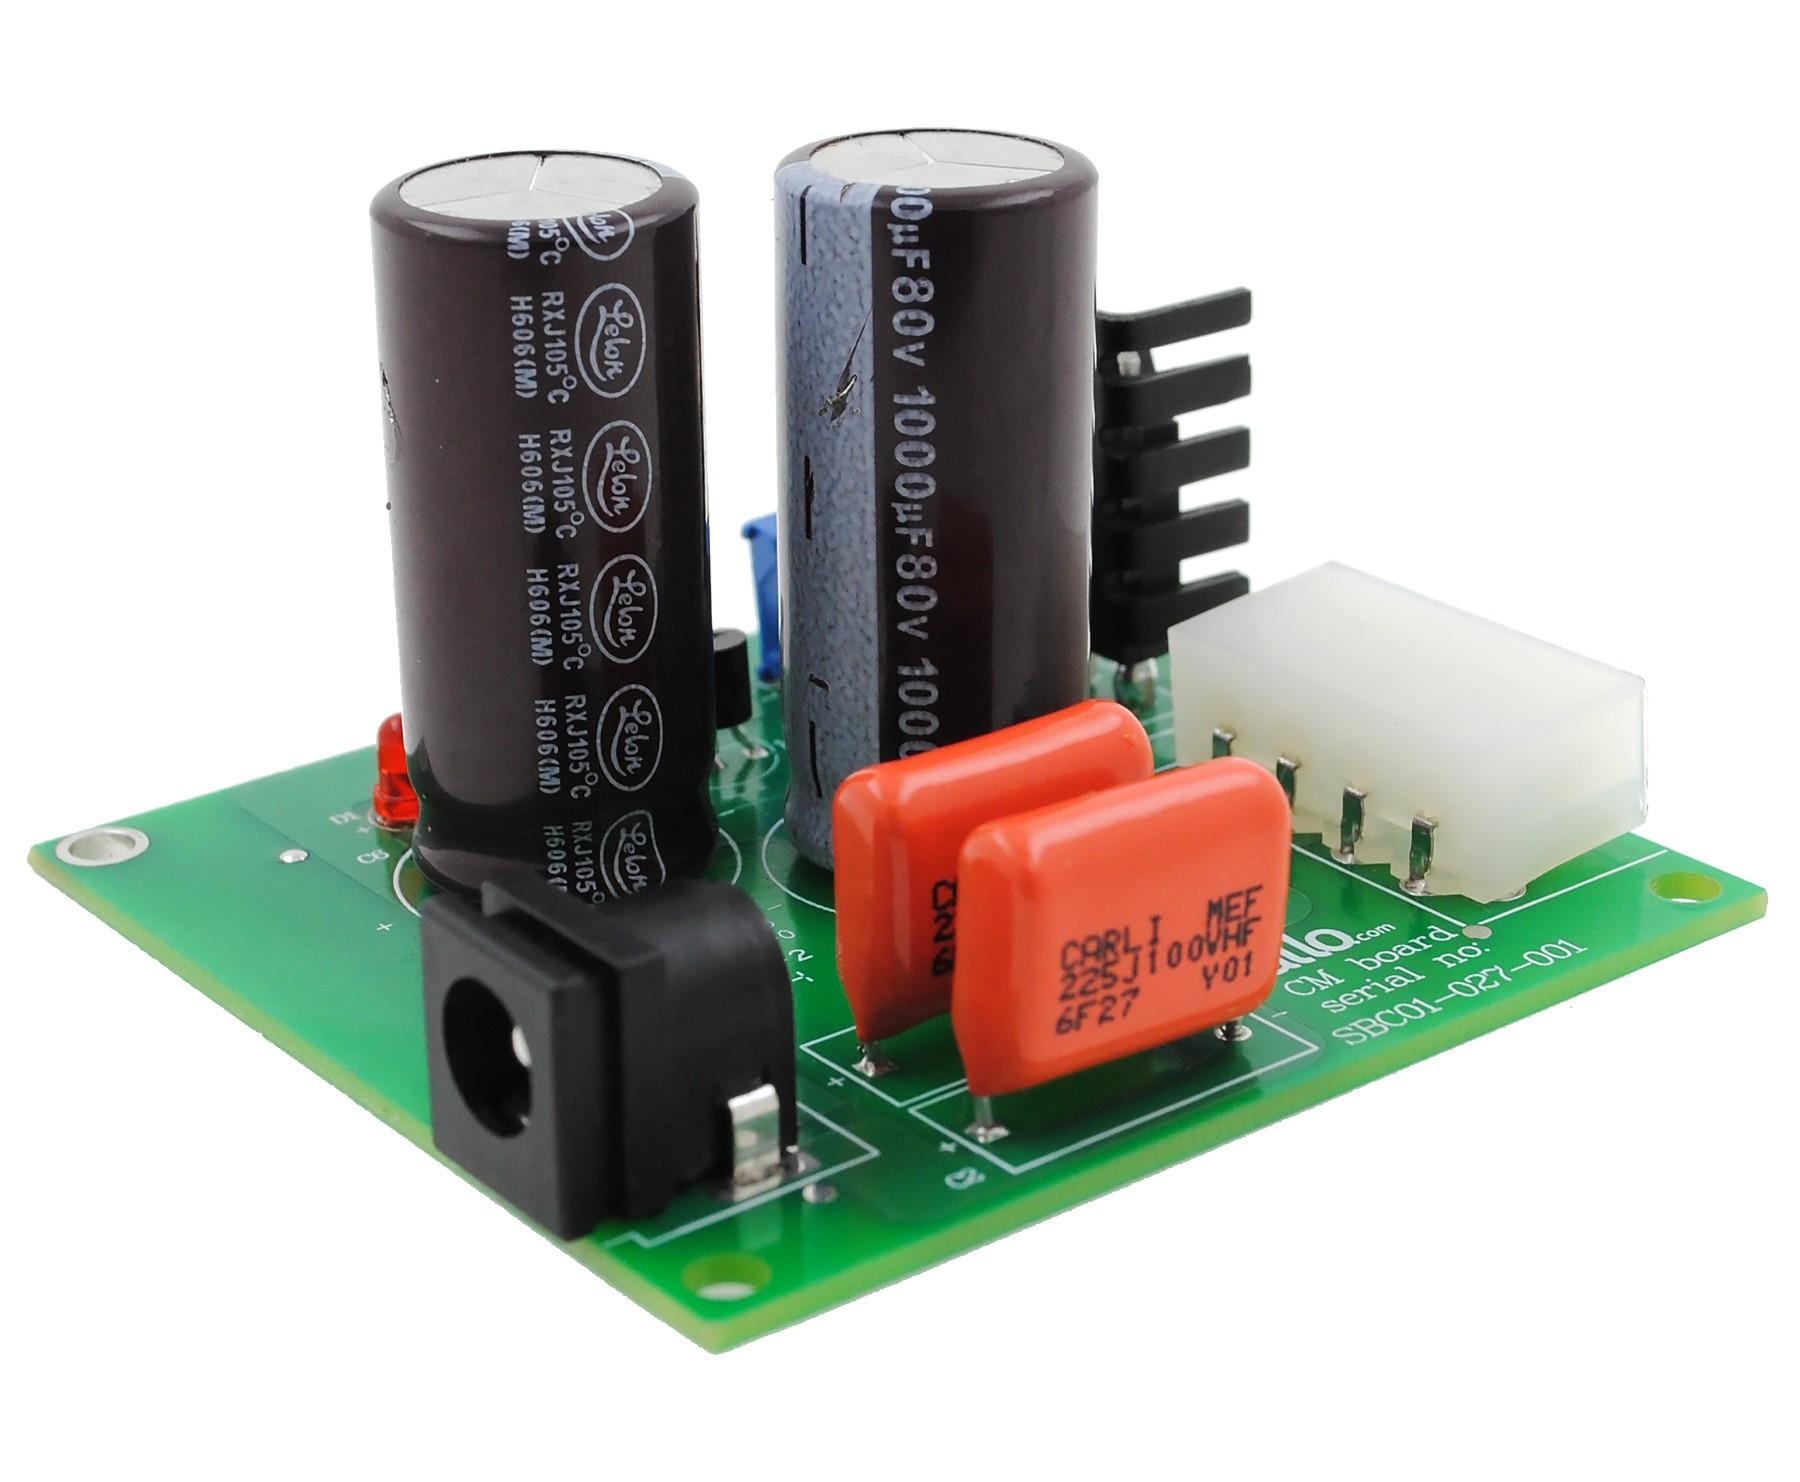 24 Volt 2 Amp Bench Top Power Supply Make